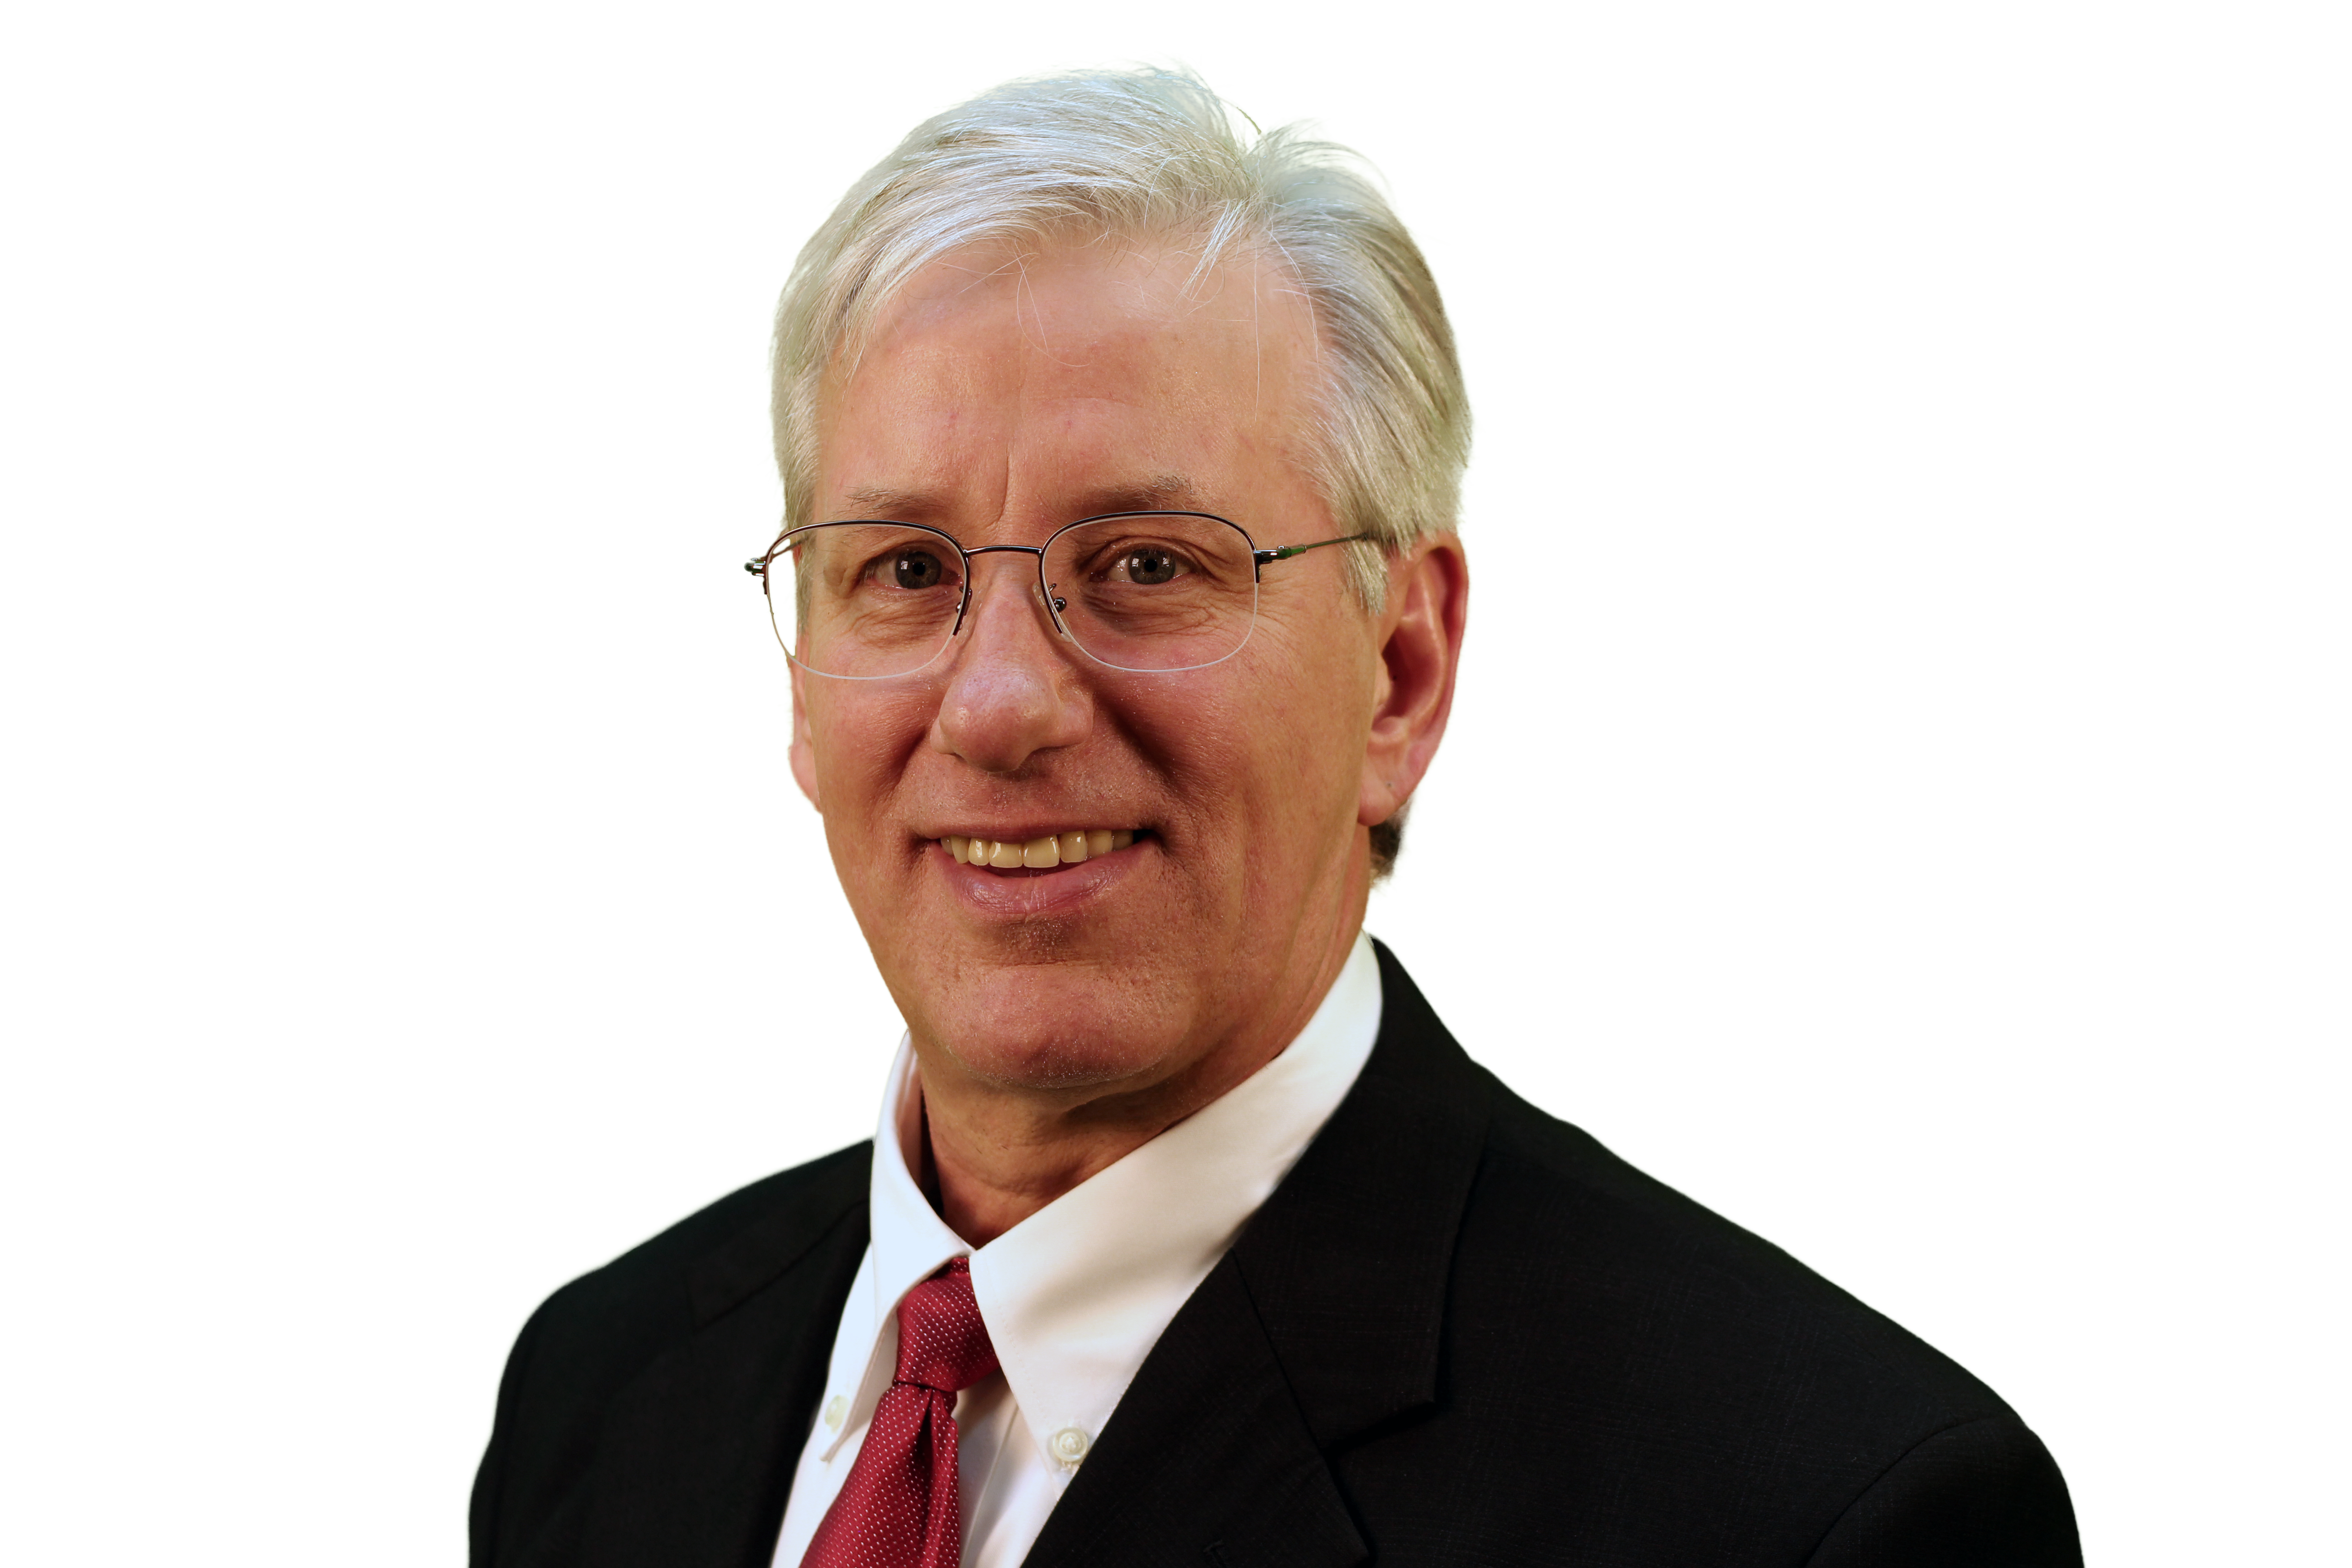 Randy L. Duvall